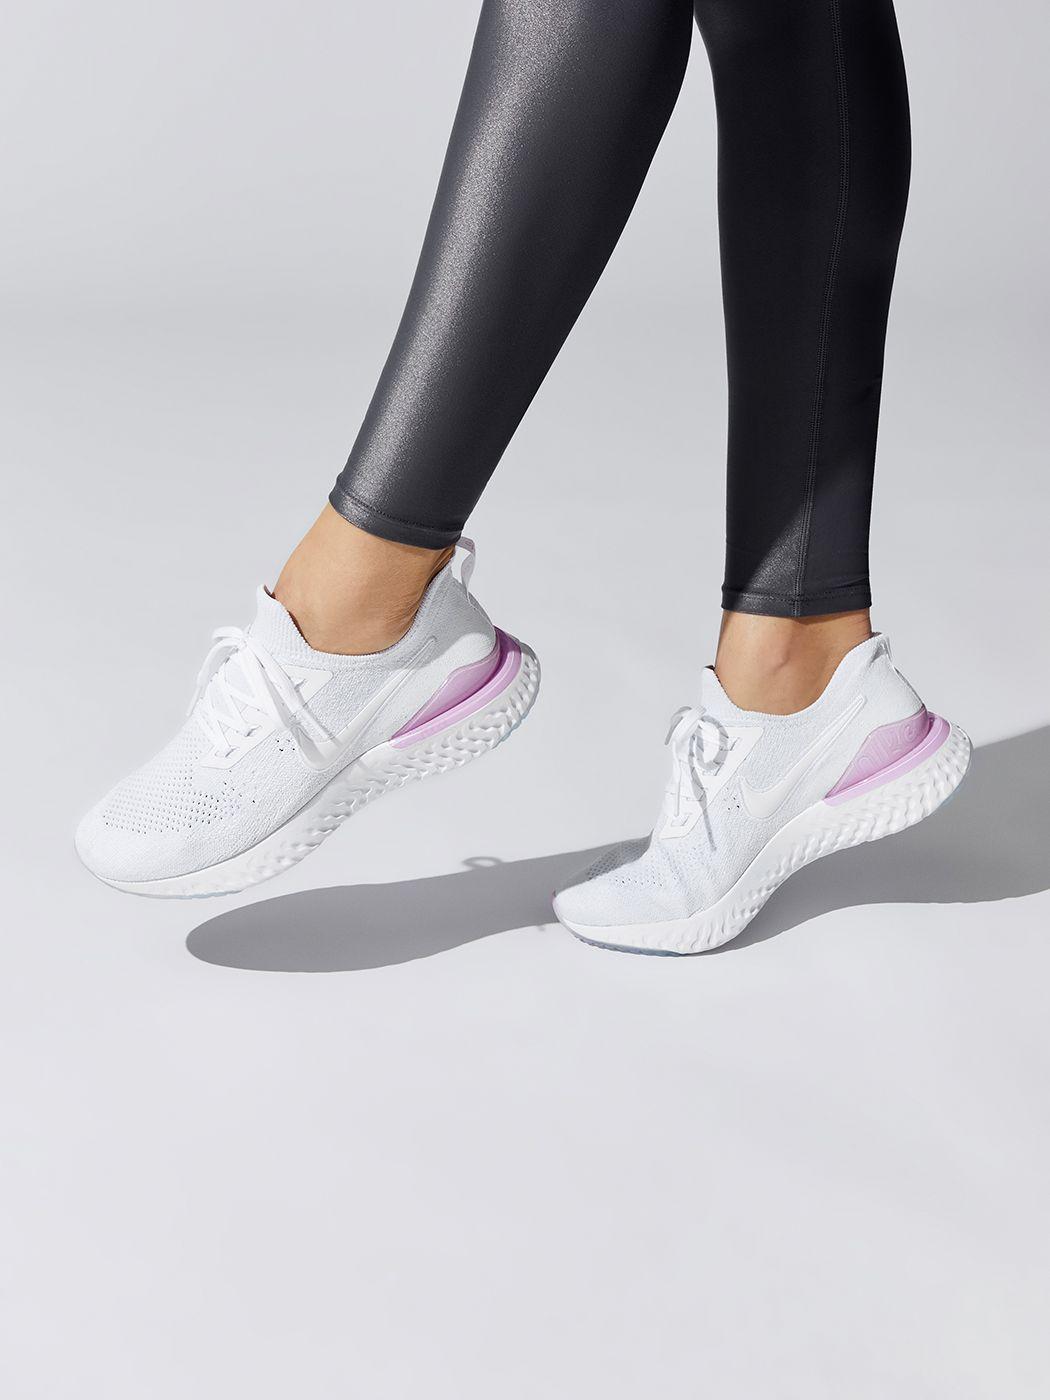 Nike Epic React Flyknit 2 in Whitewhite pink Foam | Nike